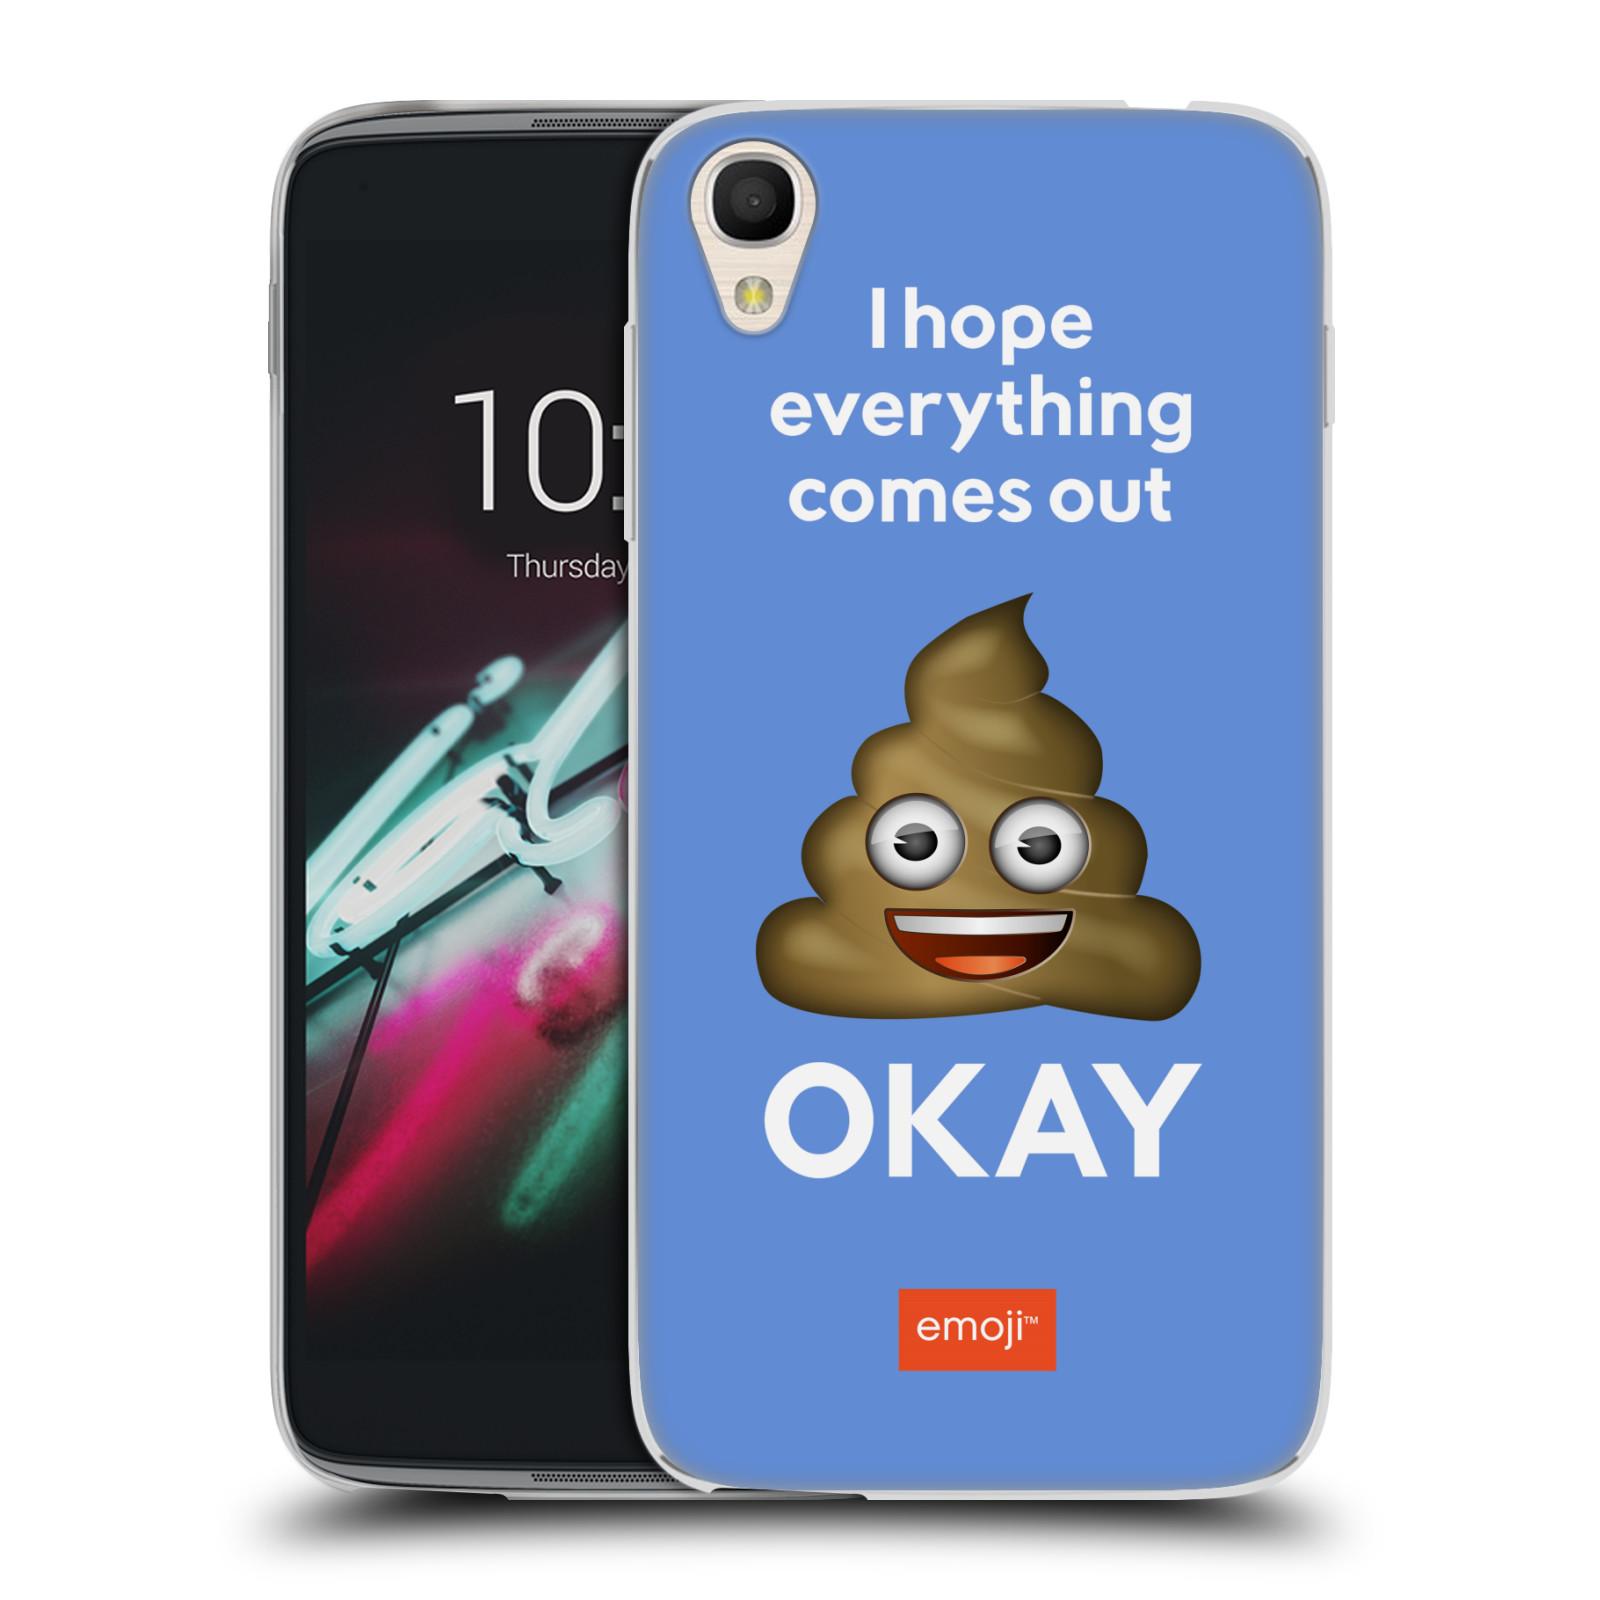 "Silikonové pouzdro na mobil Alcatel One Touch 6039Y Idol 3 HEAD CASE EMOJI - Hovínko OKAY (Silikonový kryt či obal s oficiálním motivem EMOJI na mobilní telefon Alcatel One Touch Idol 3 OT-6039Y s 4,7"" displejem)"